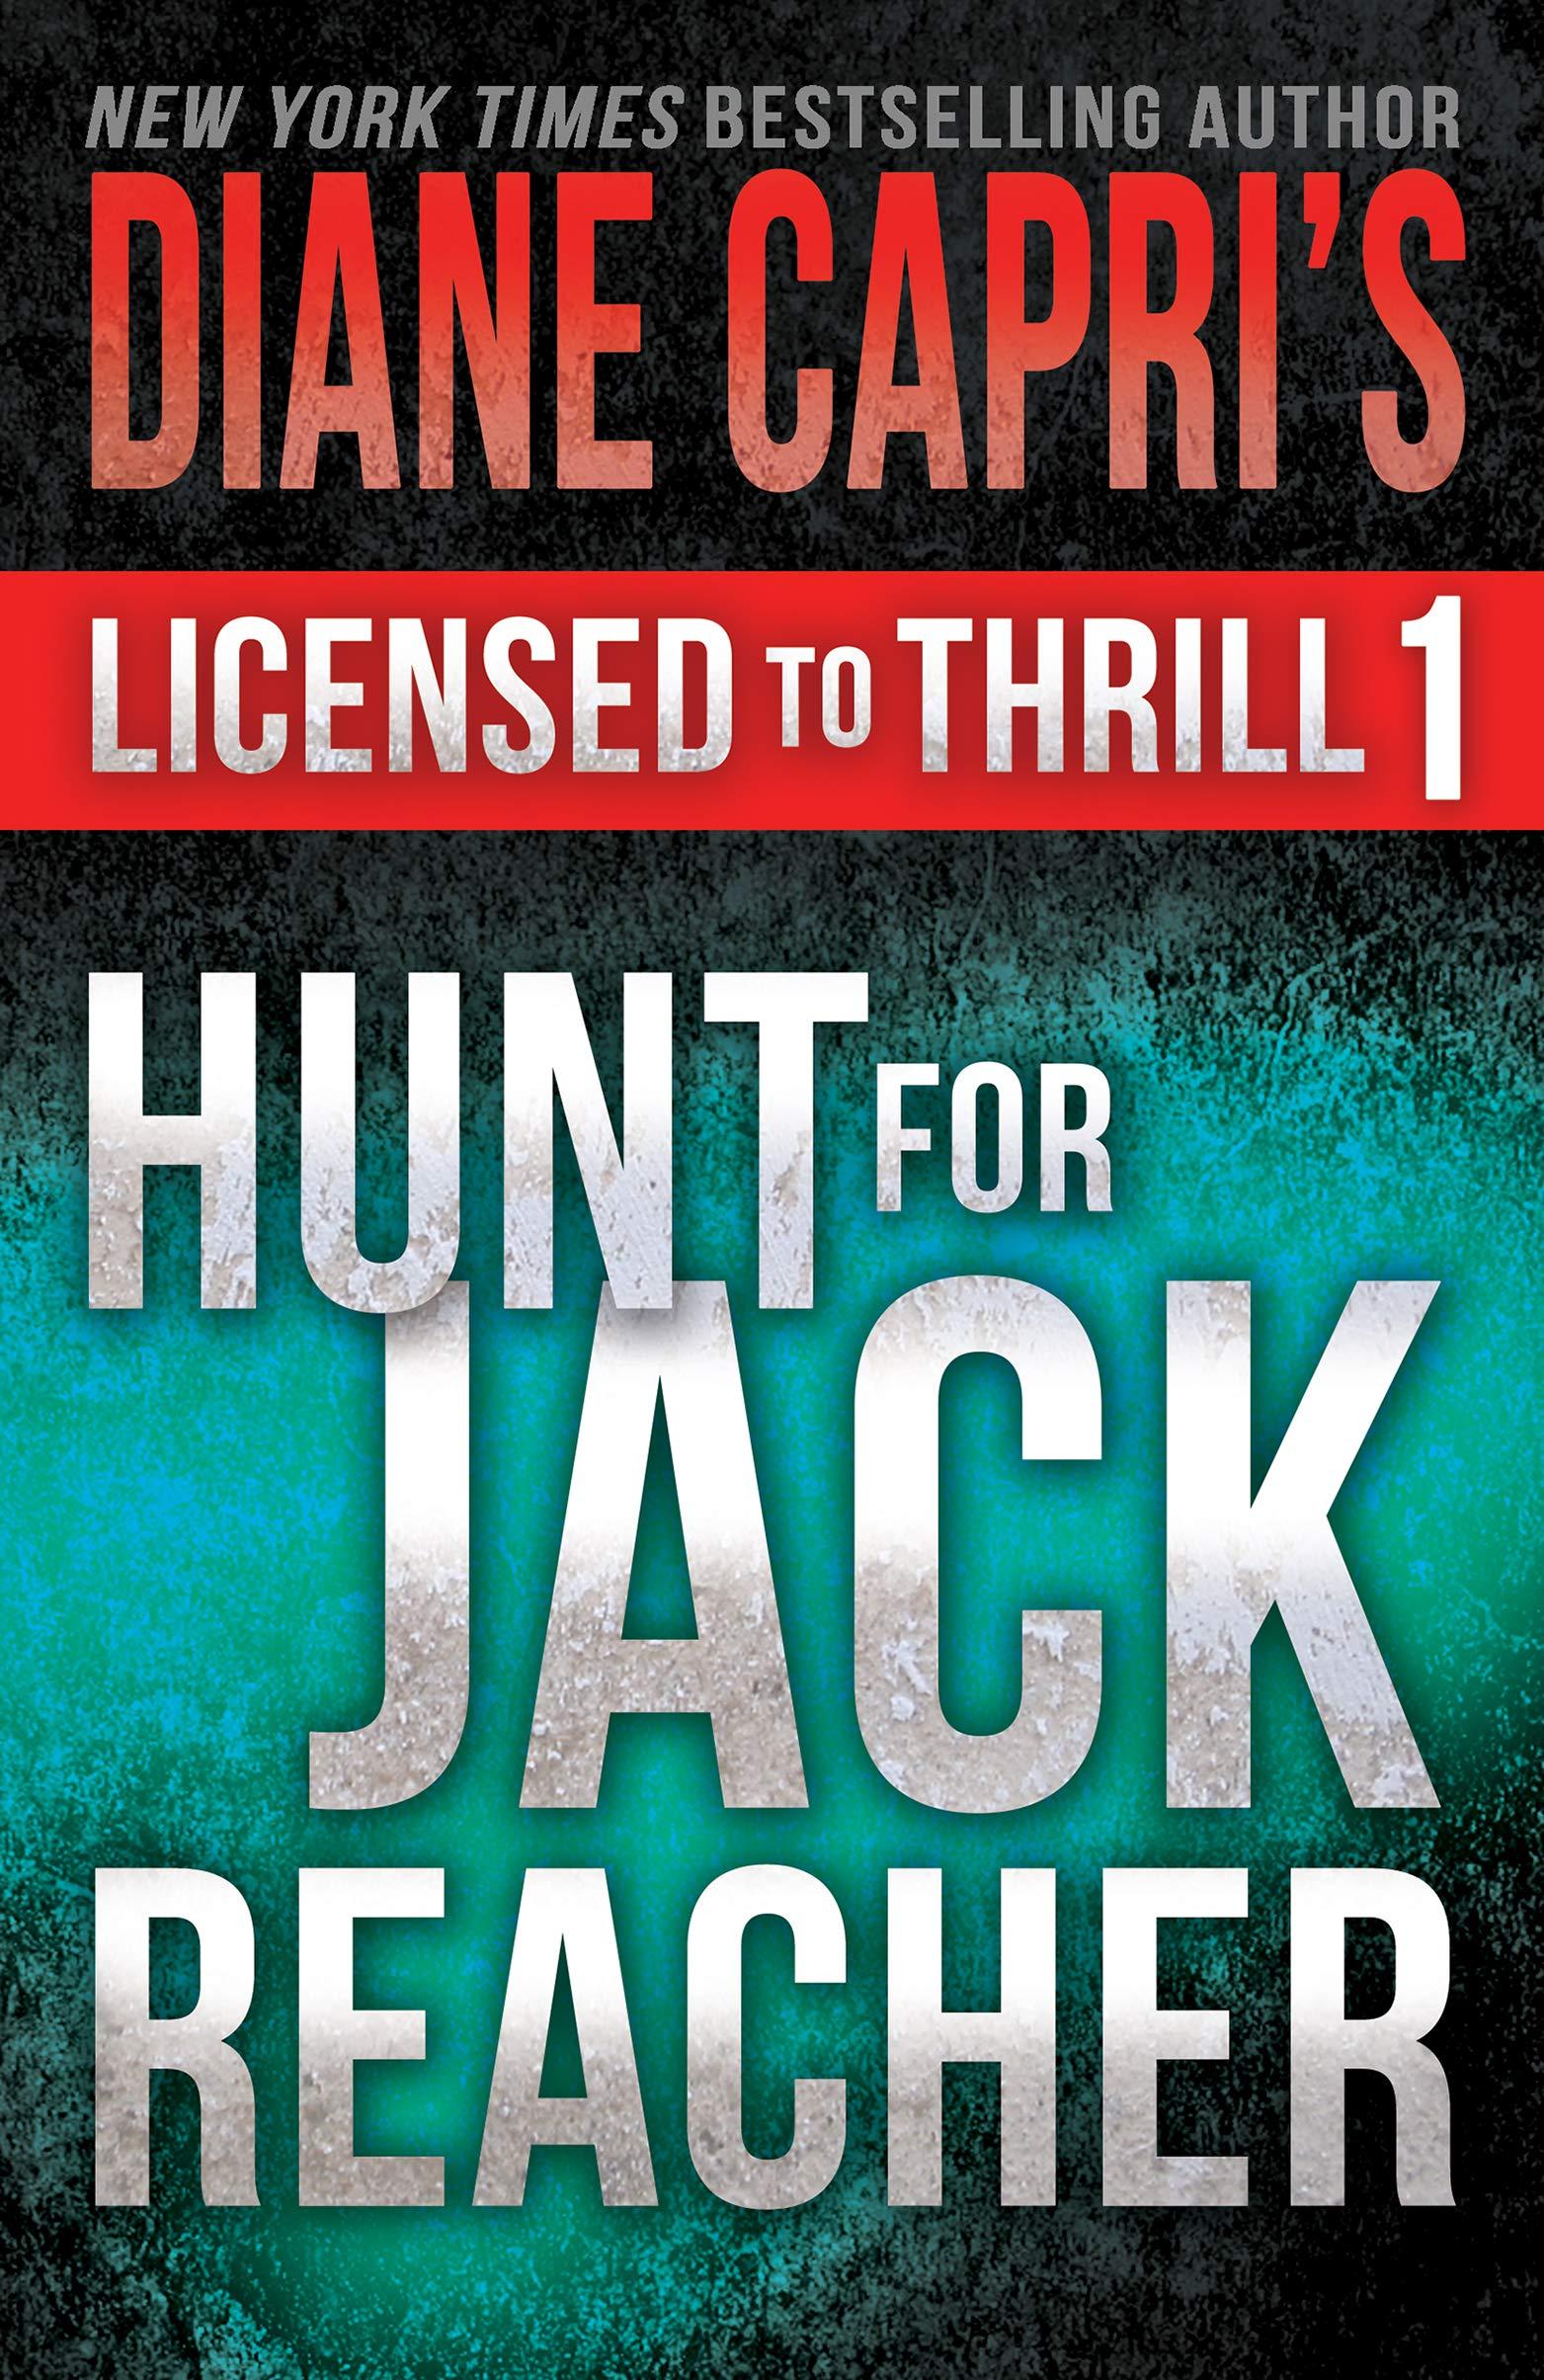 Licensed to Thrill 1: Hunt For Jack Reacher Series Thrillers Books 1-3 (Diane Capri's Licensed to Thrill Sets)